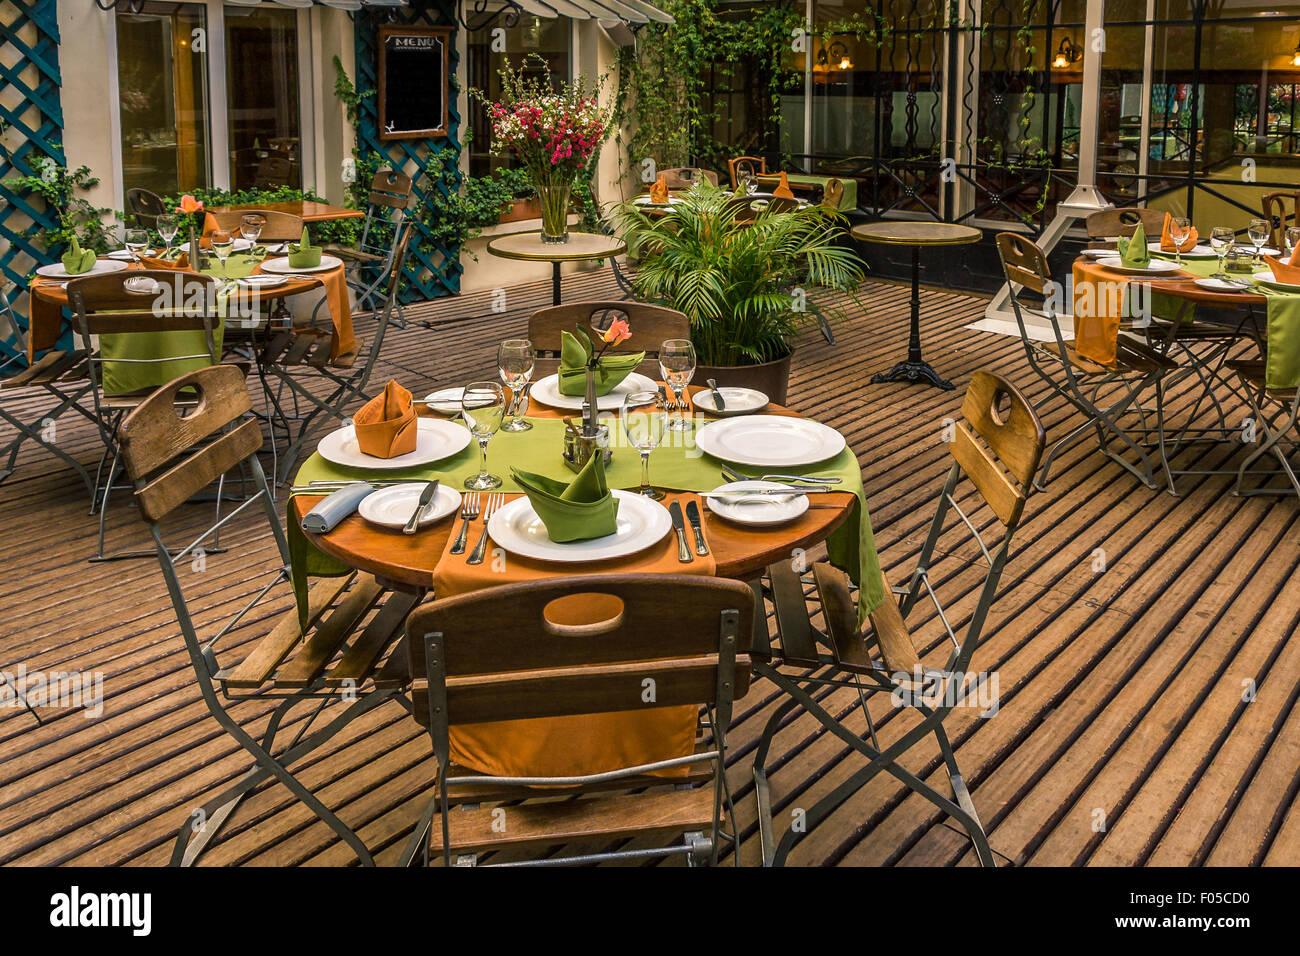 Outdoor Terrace Of A Cozy Restaurant Stock Photo Alamy